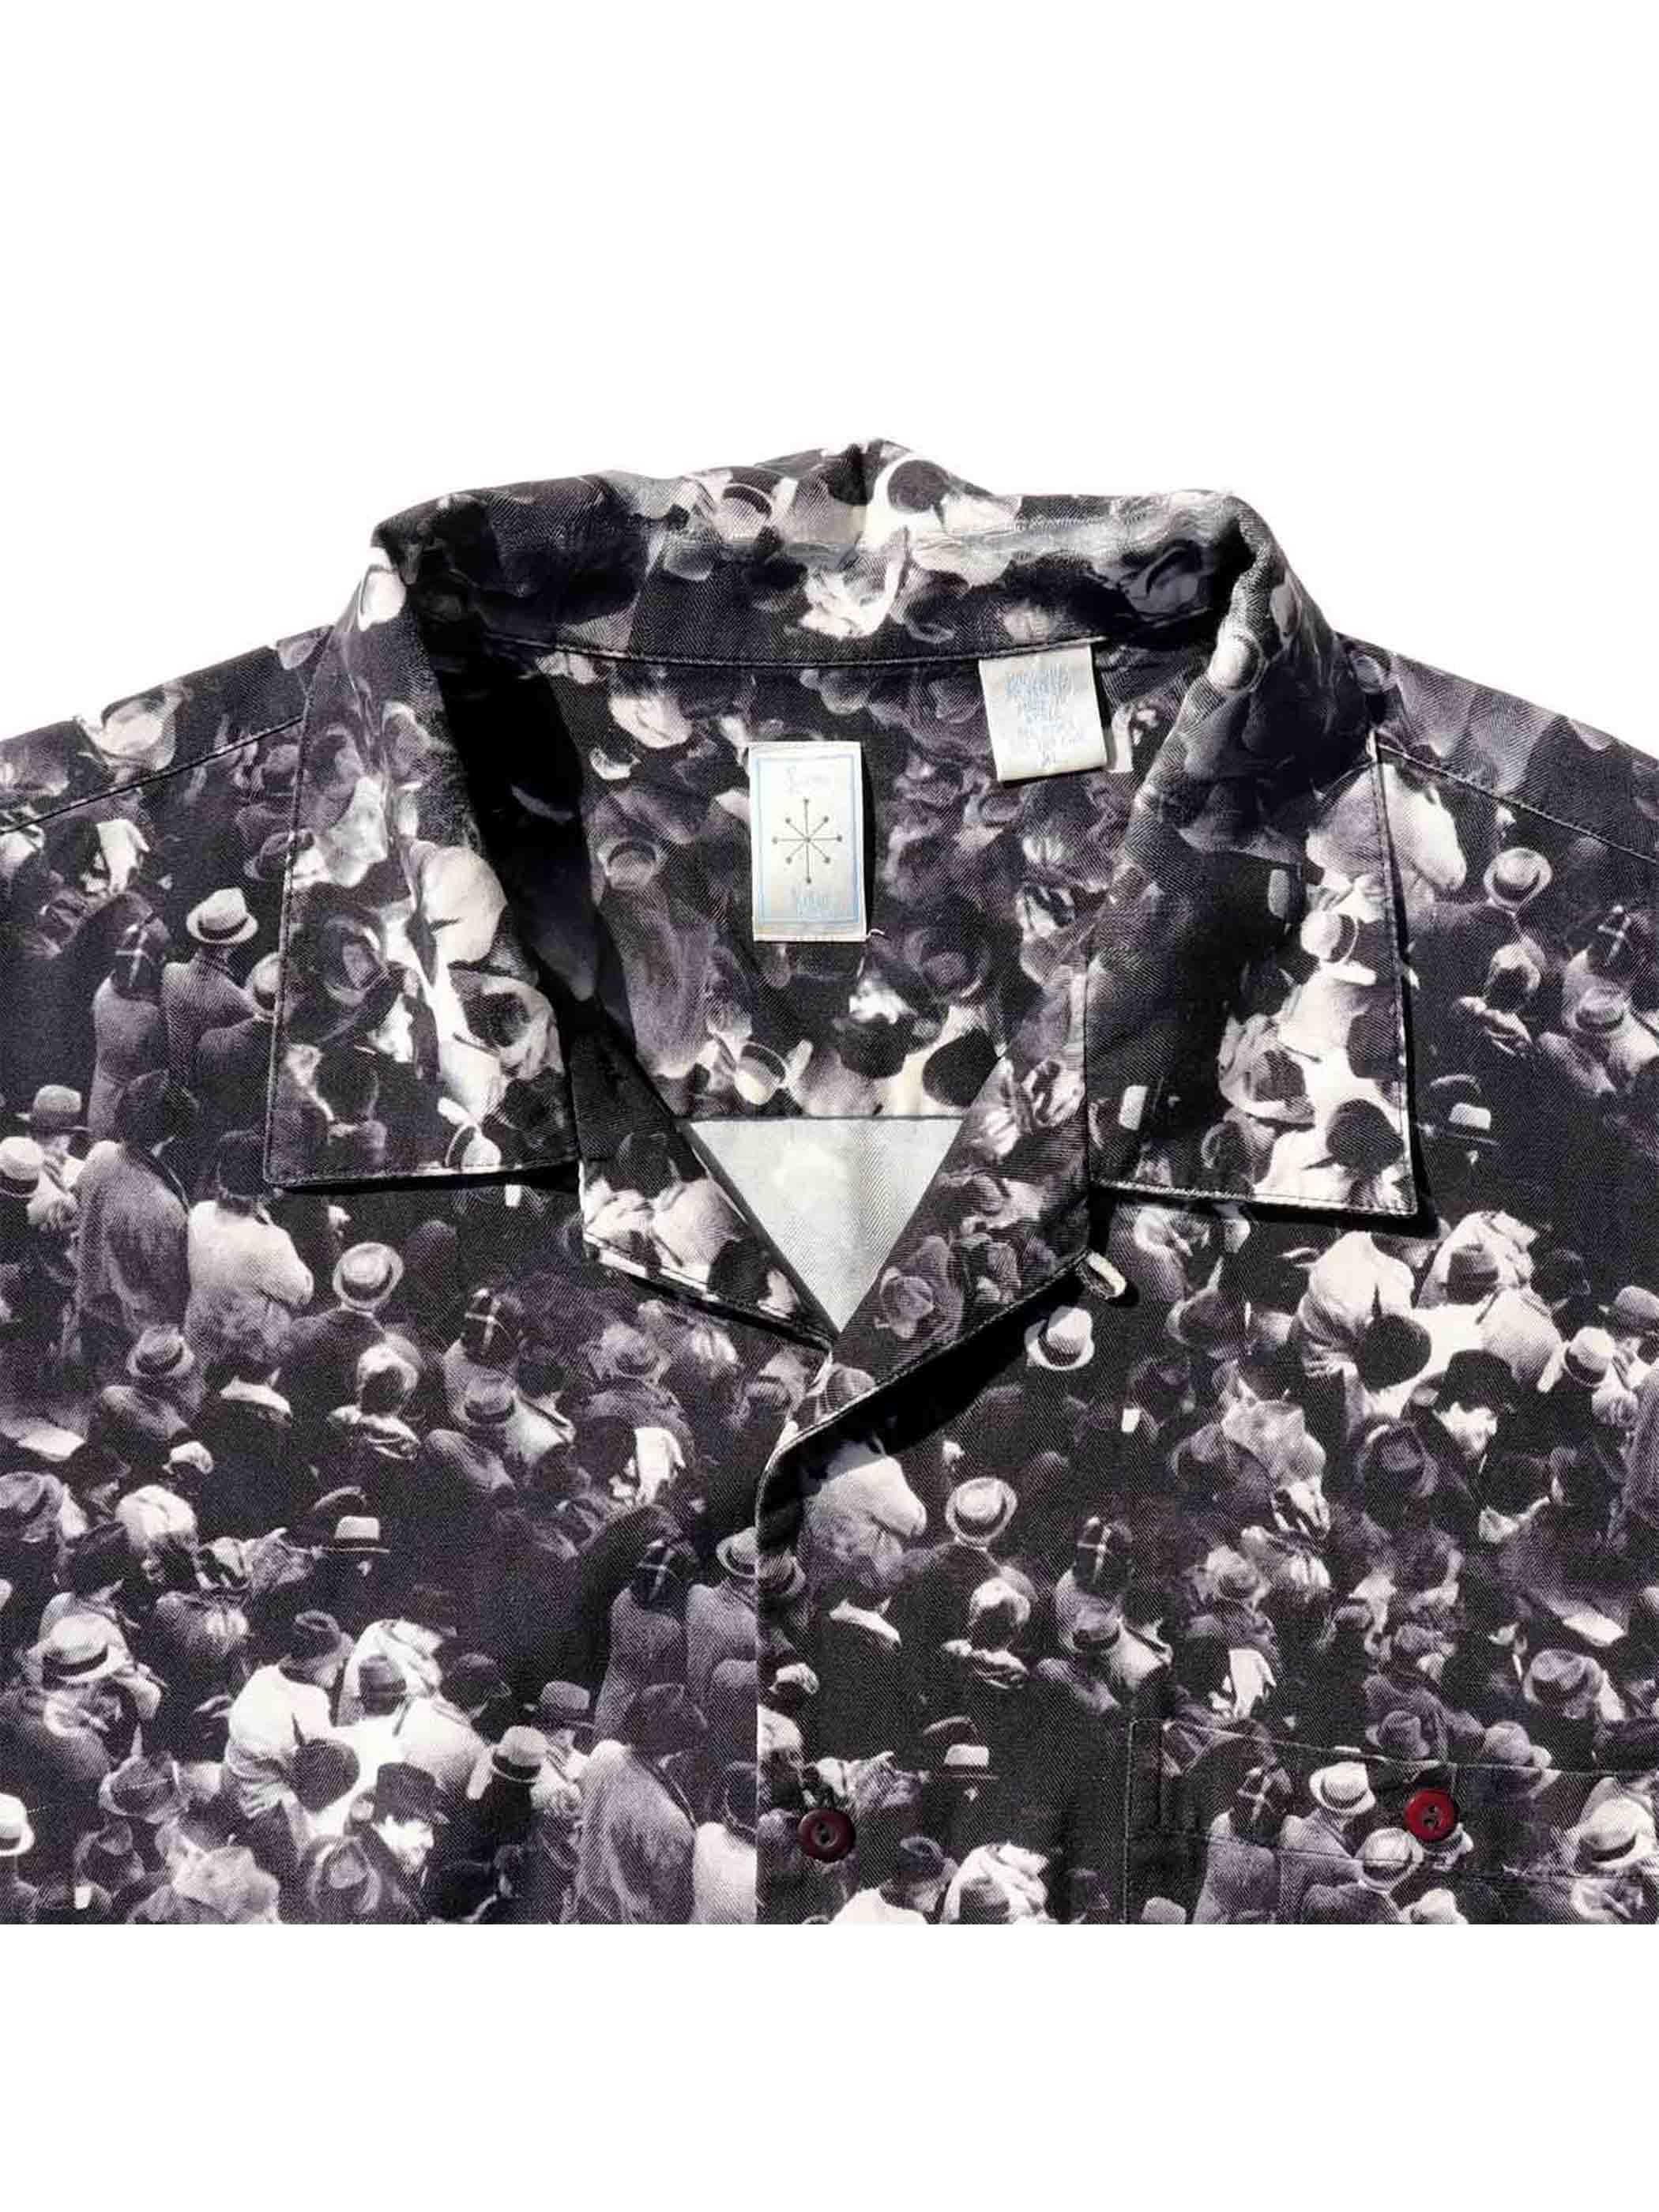 90's~ BURMA BIBAS 群集フォト シルク オープンカラーシャツ [XL]